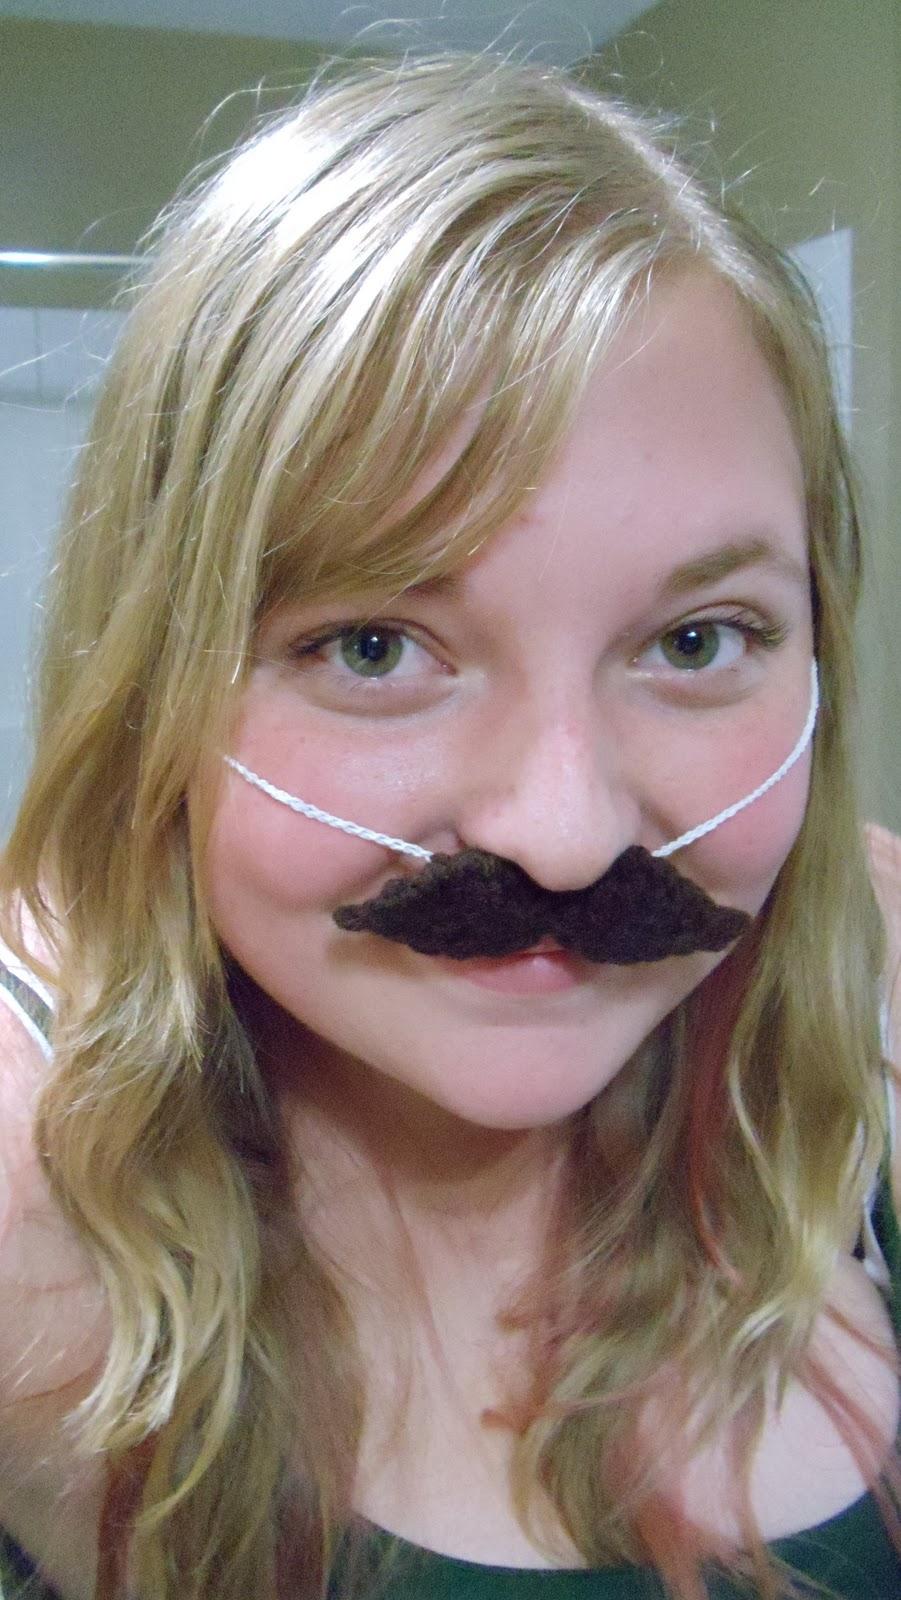 Wichecraft mustache necklace disguise mustache necklace disguise mustache necklace pattern bankloansurffo Images